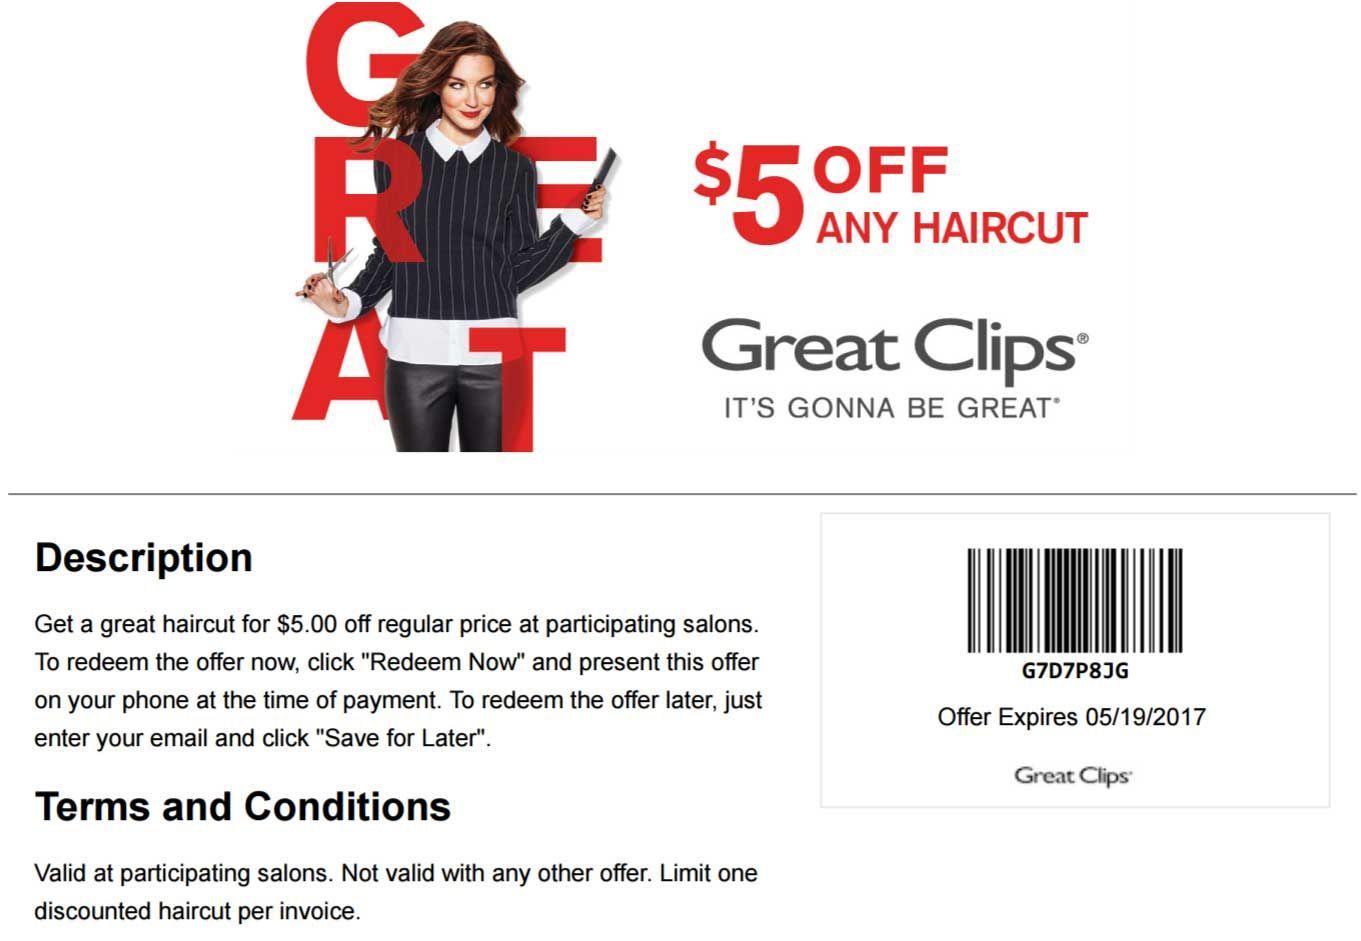 Pinsai Prashant Gnaneshwar On Hair Cut Salon | Pinterest | Great - Great Clips Free Coupons Printable